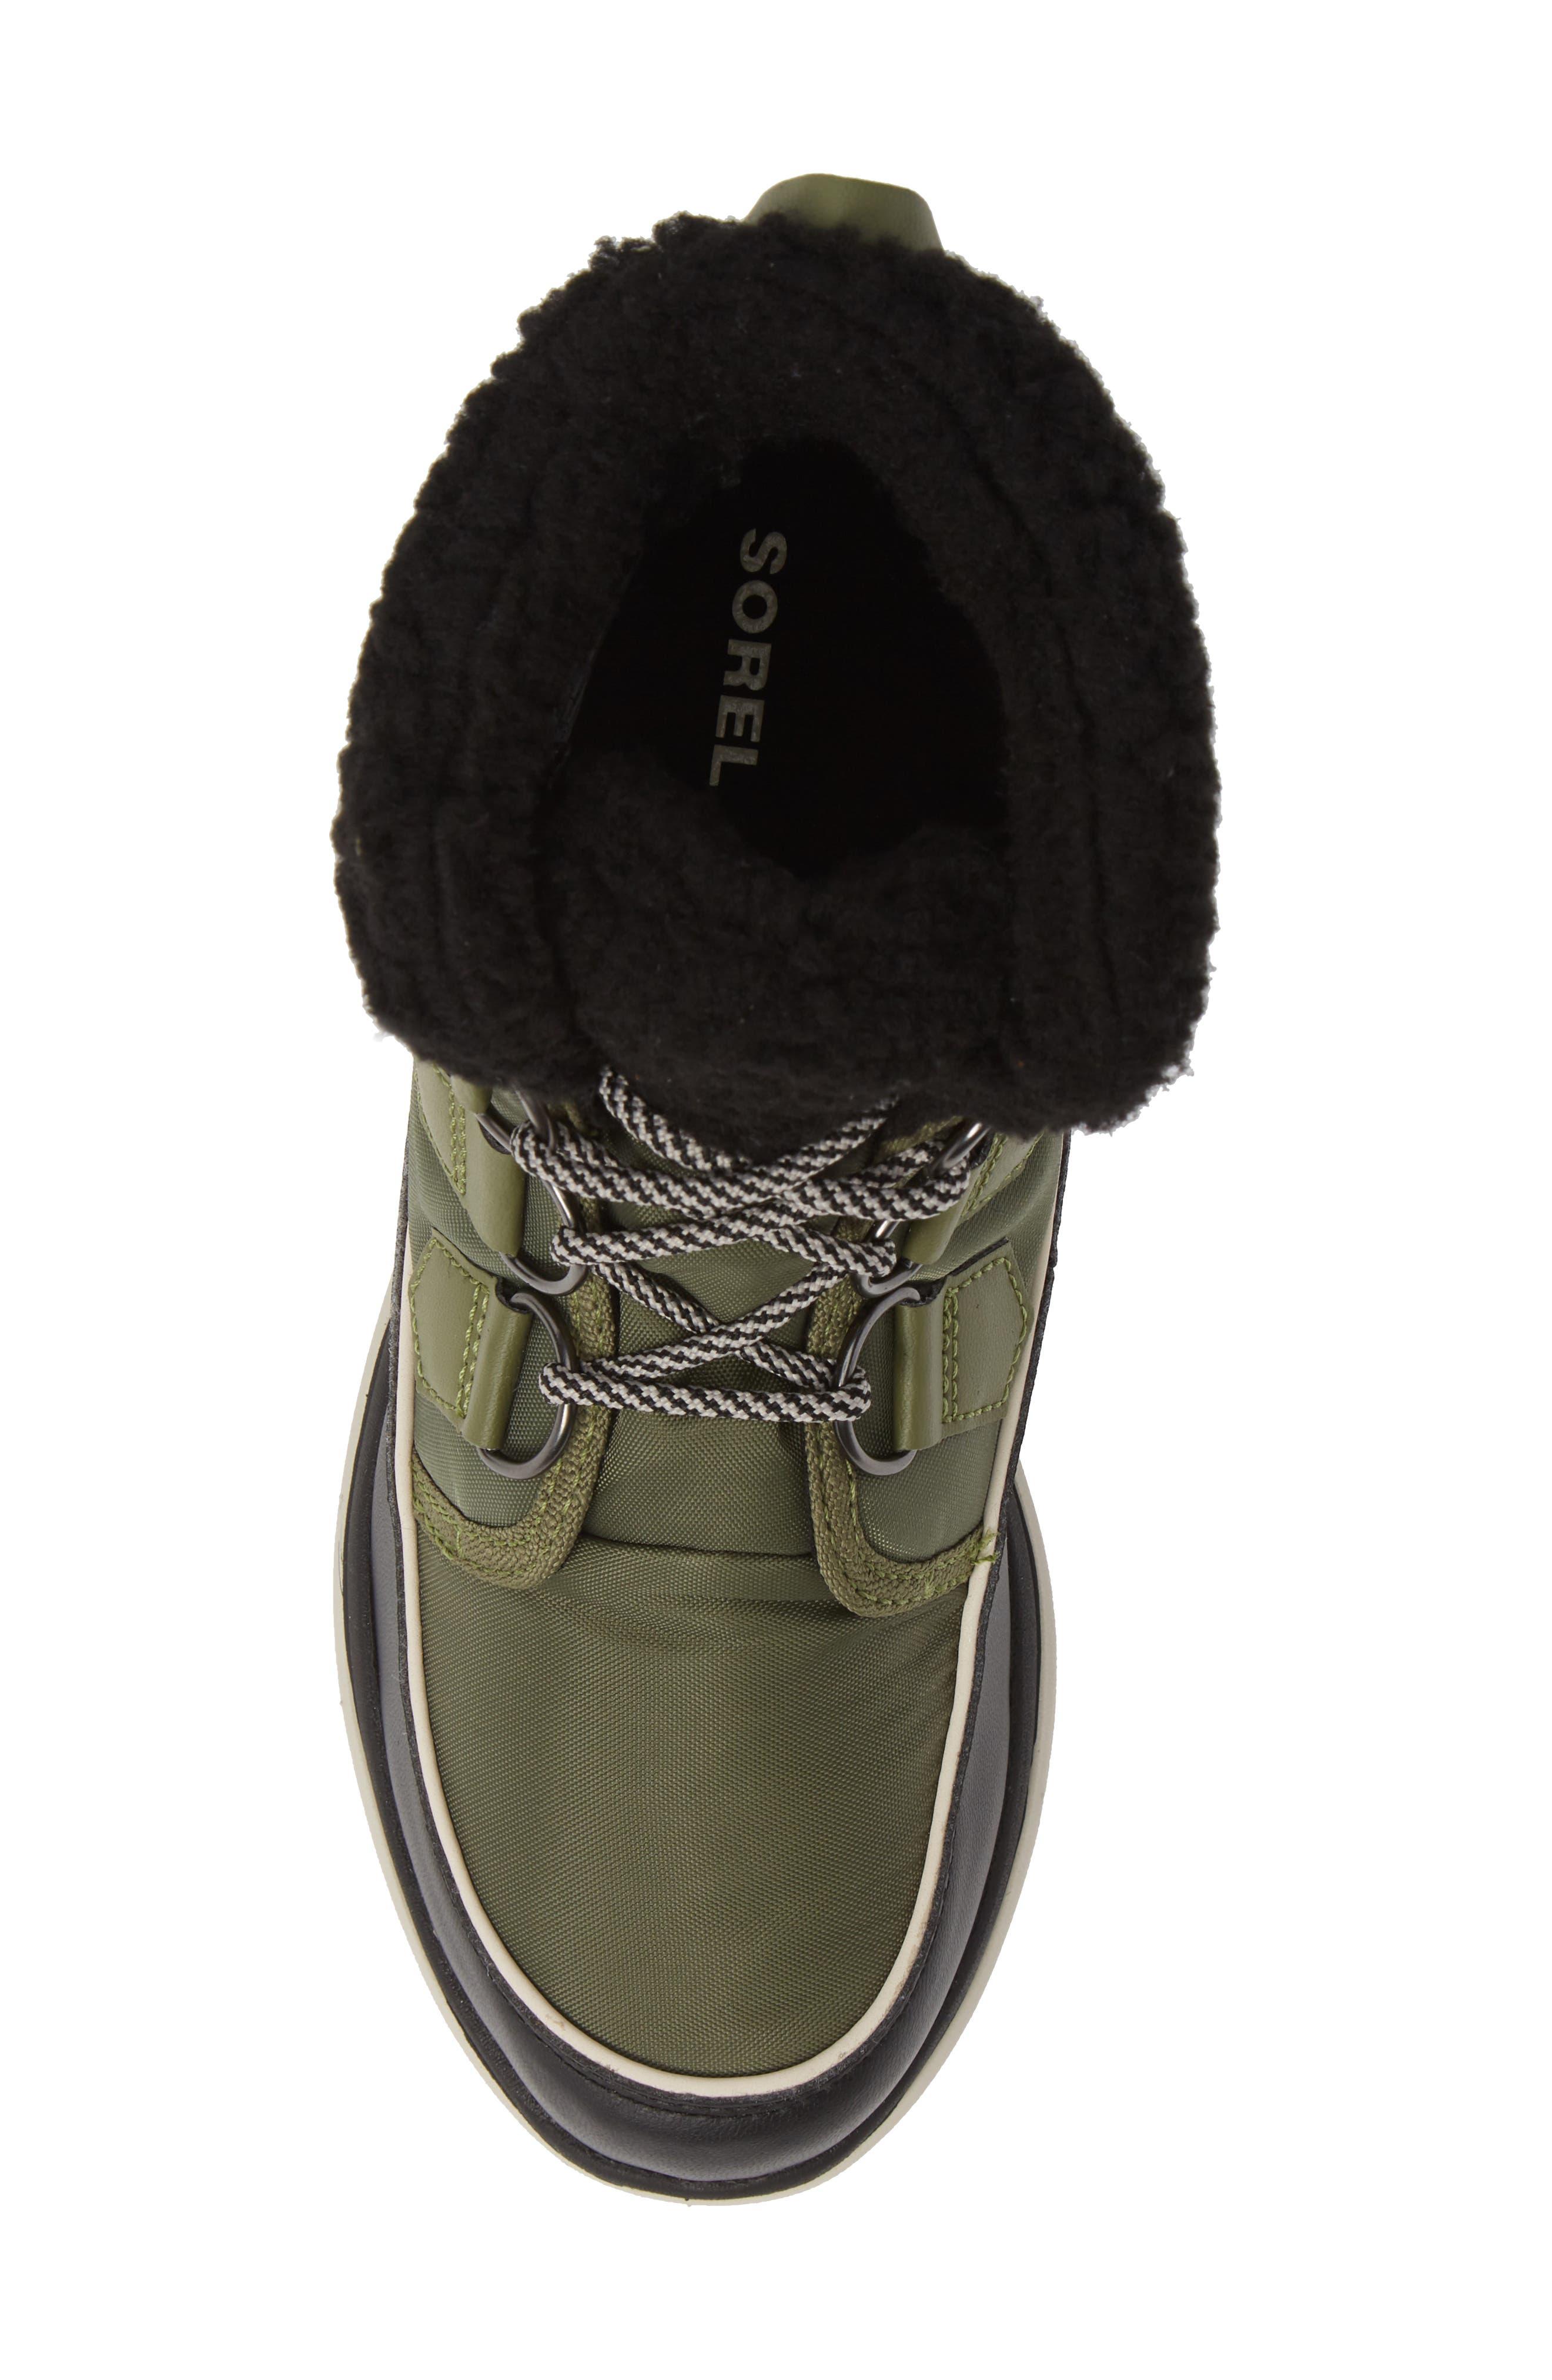 Explorer Carnival Waterproof Boot with Faux Fur Collar,                             Alternate thumbnail 5, color,                             371